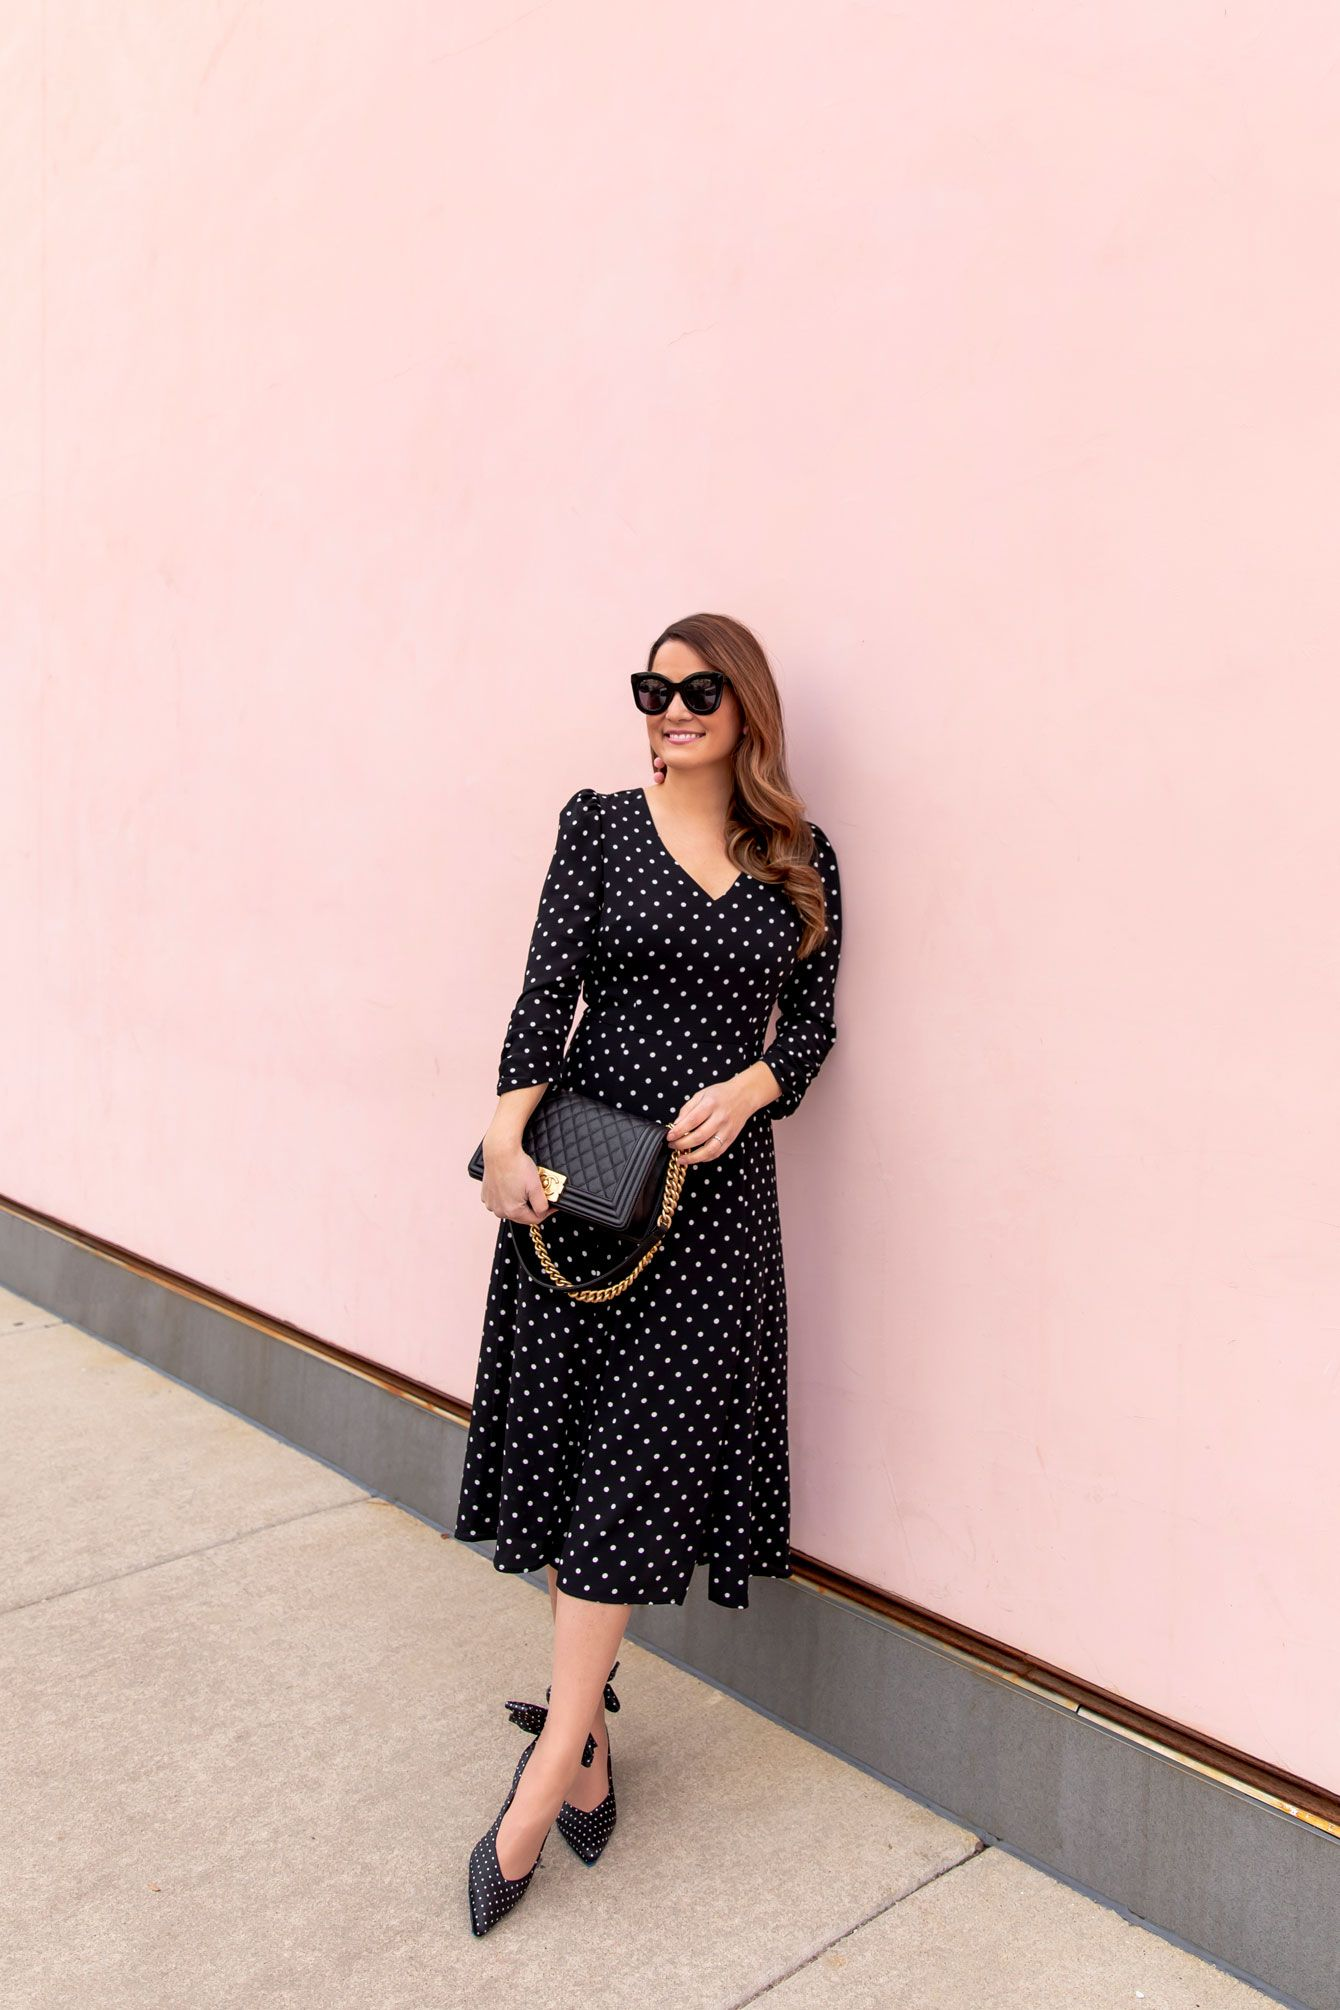 Styling A Long Sleeve Polka Dot Midi Dress Style Charade Midi Dress Style Medi Dress Midi Dress [ 2010 x 1340 Pixel ]